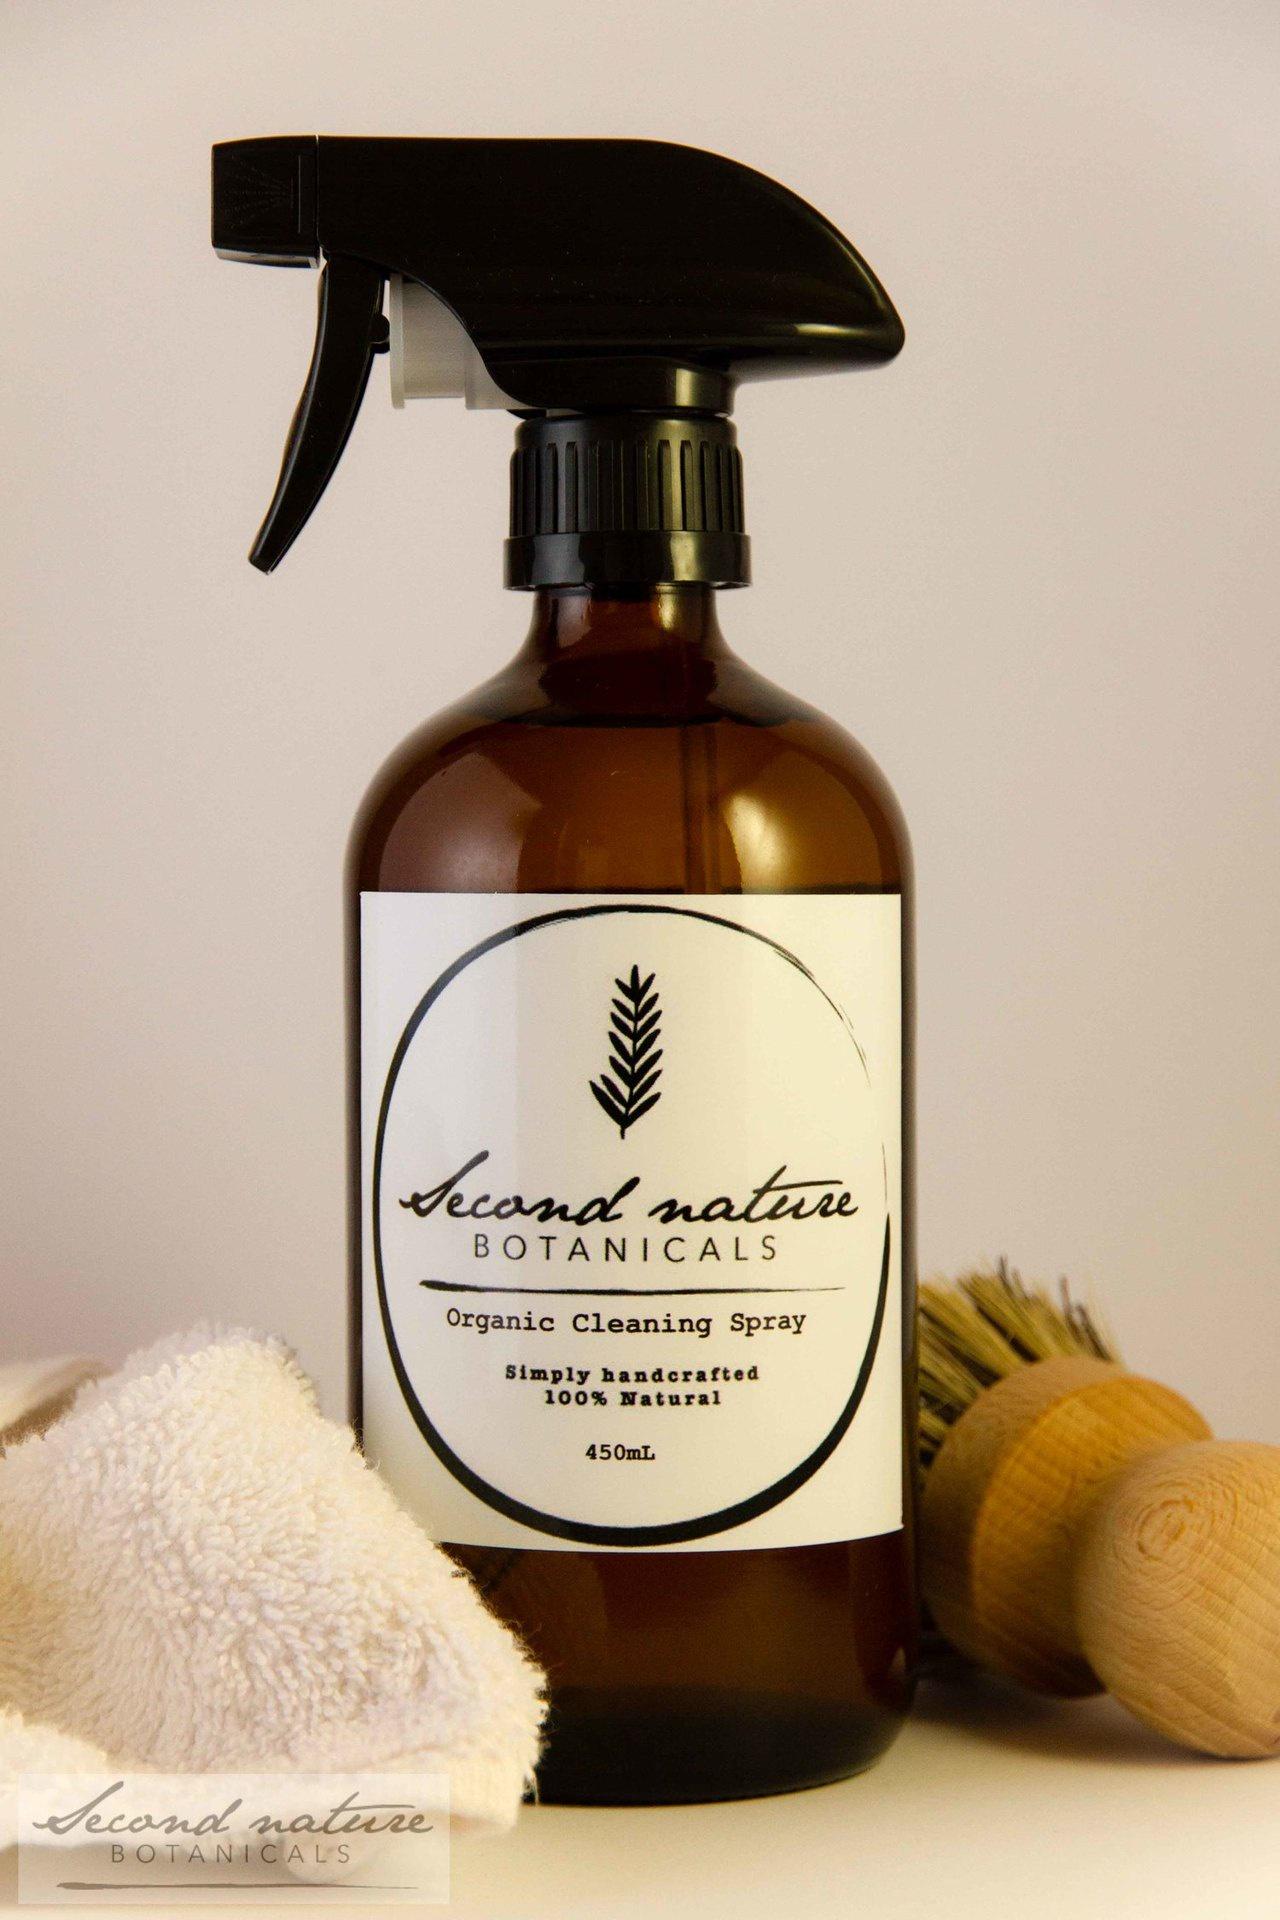 Organic Cleaning Spray